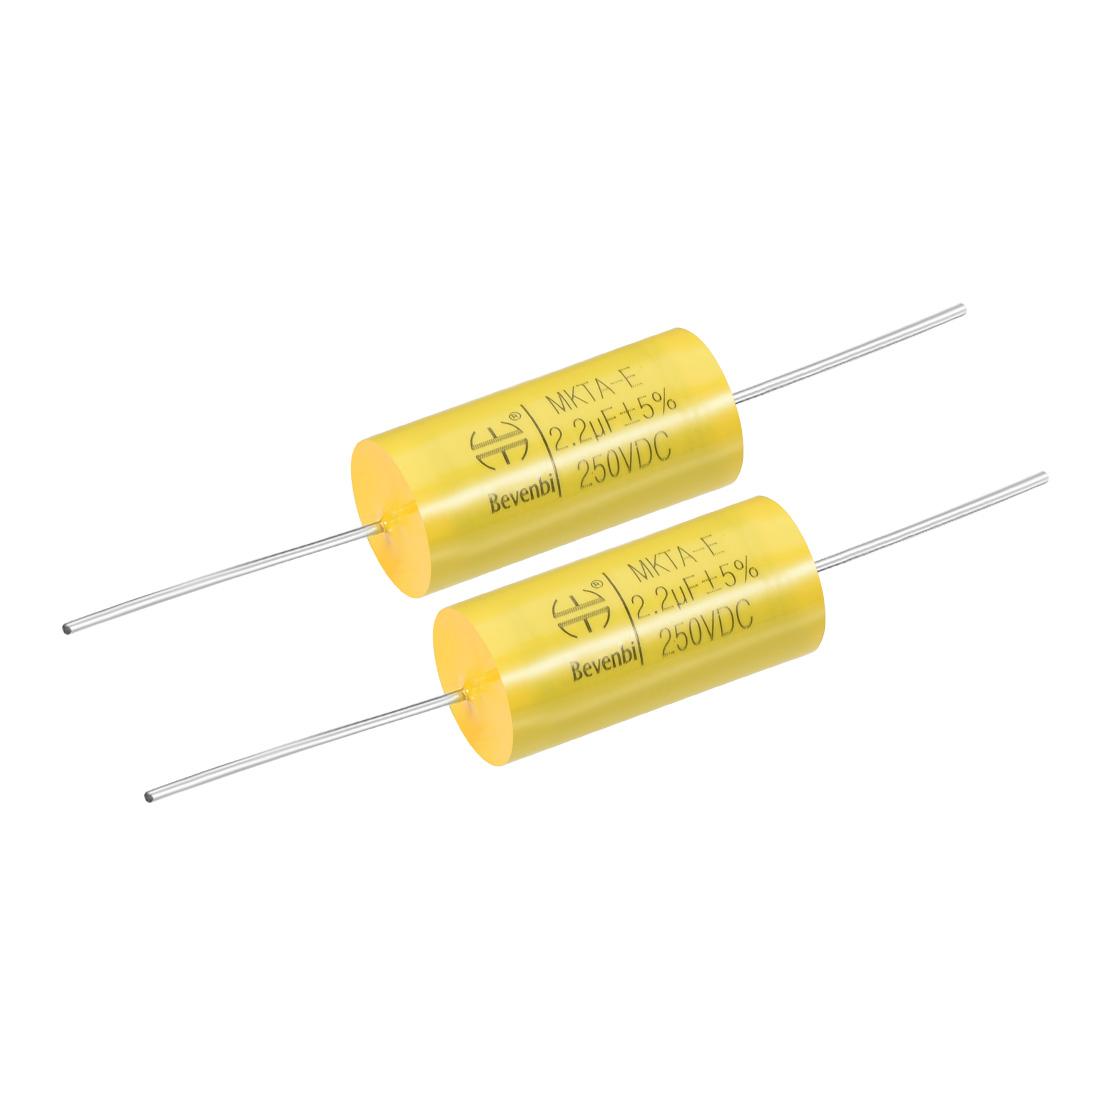 Film Capacitor 250V DC 2.2uF MKTA-E Round Polypropylene Capacitors Yellow 2pcs